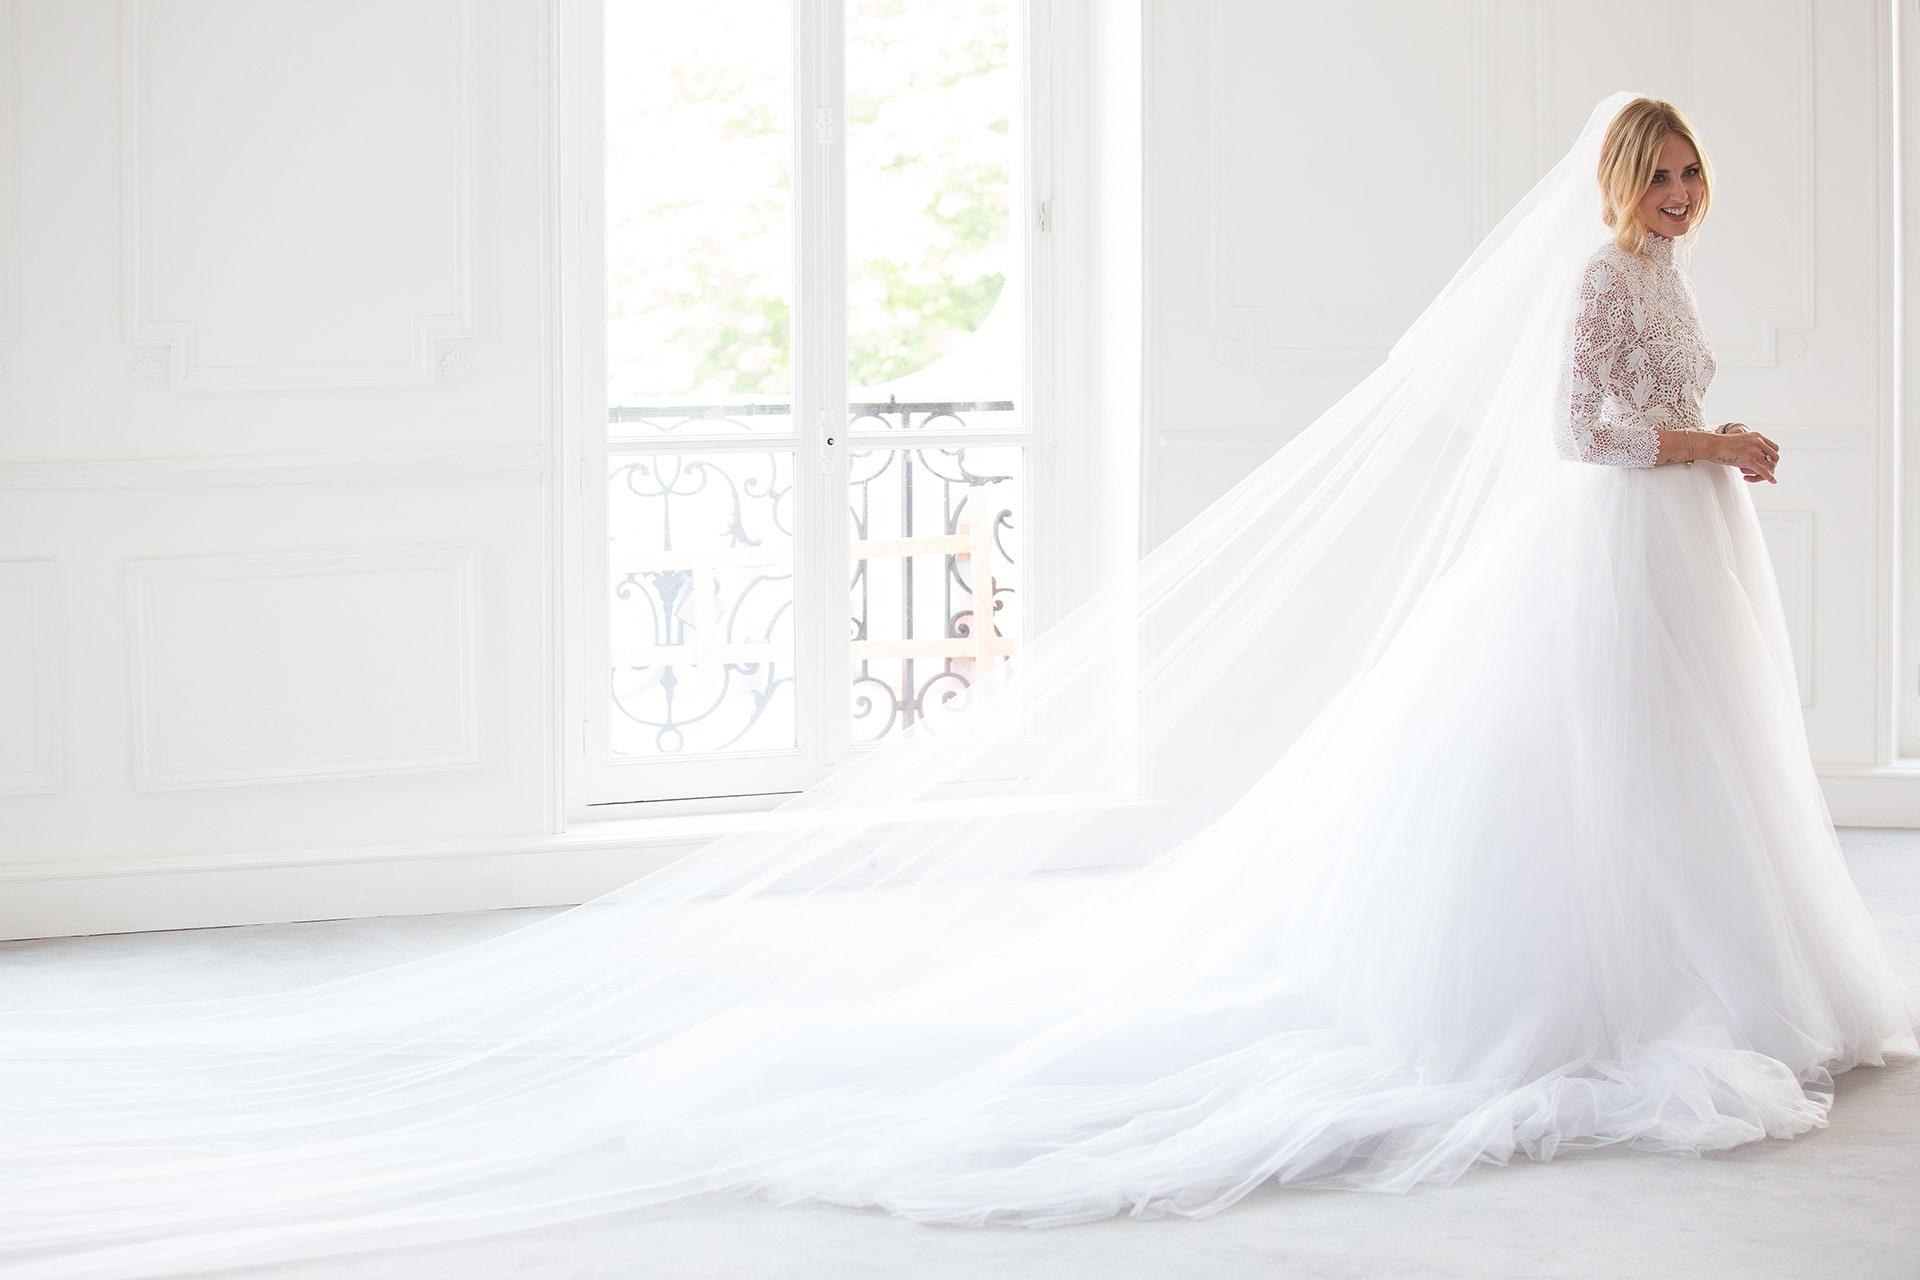 Chiara Ferragni Hochzeitskleid | Vogue Germany